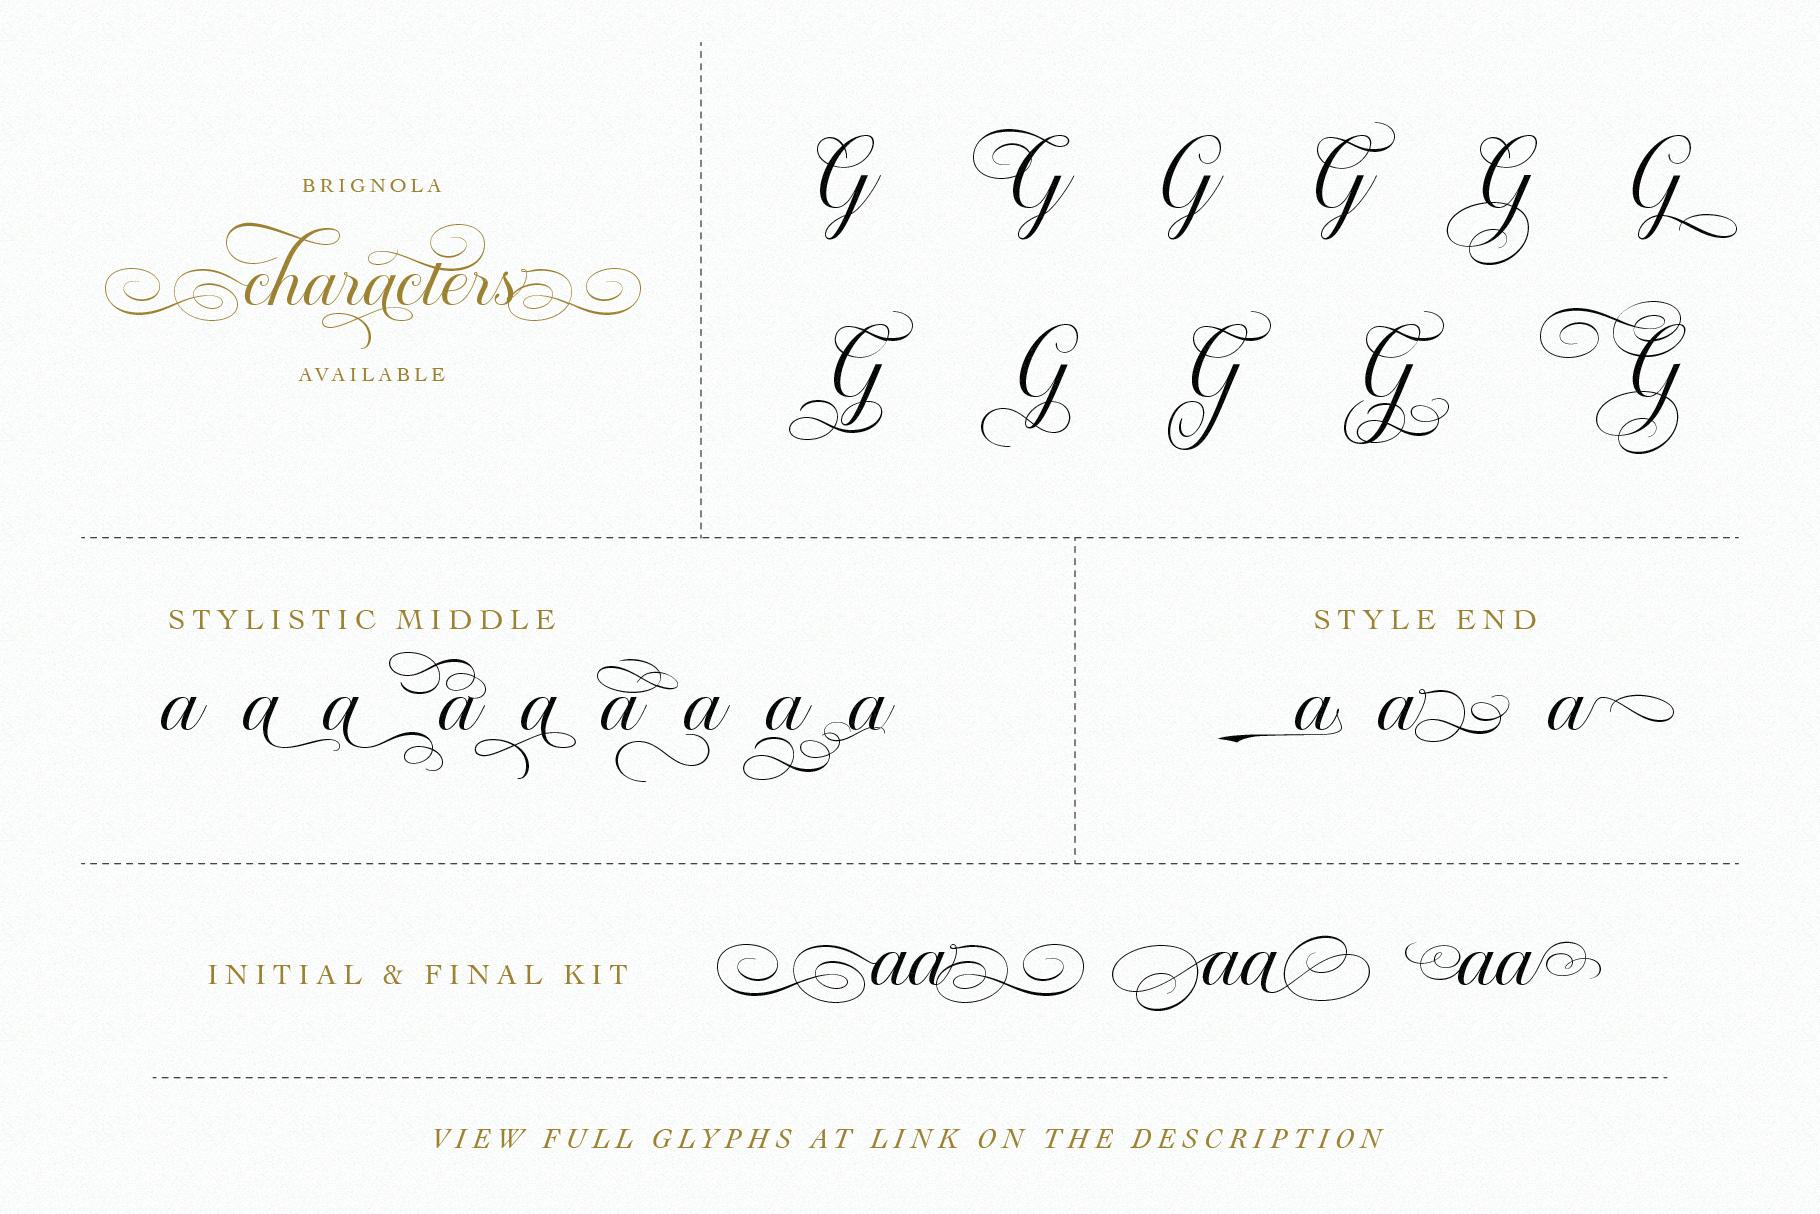 Brignola Elegant Calligraphy example image 2